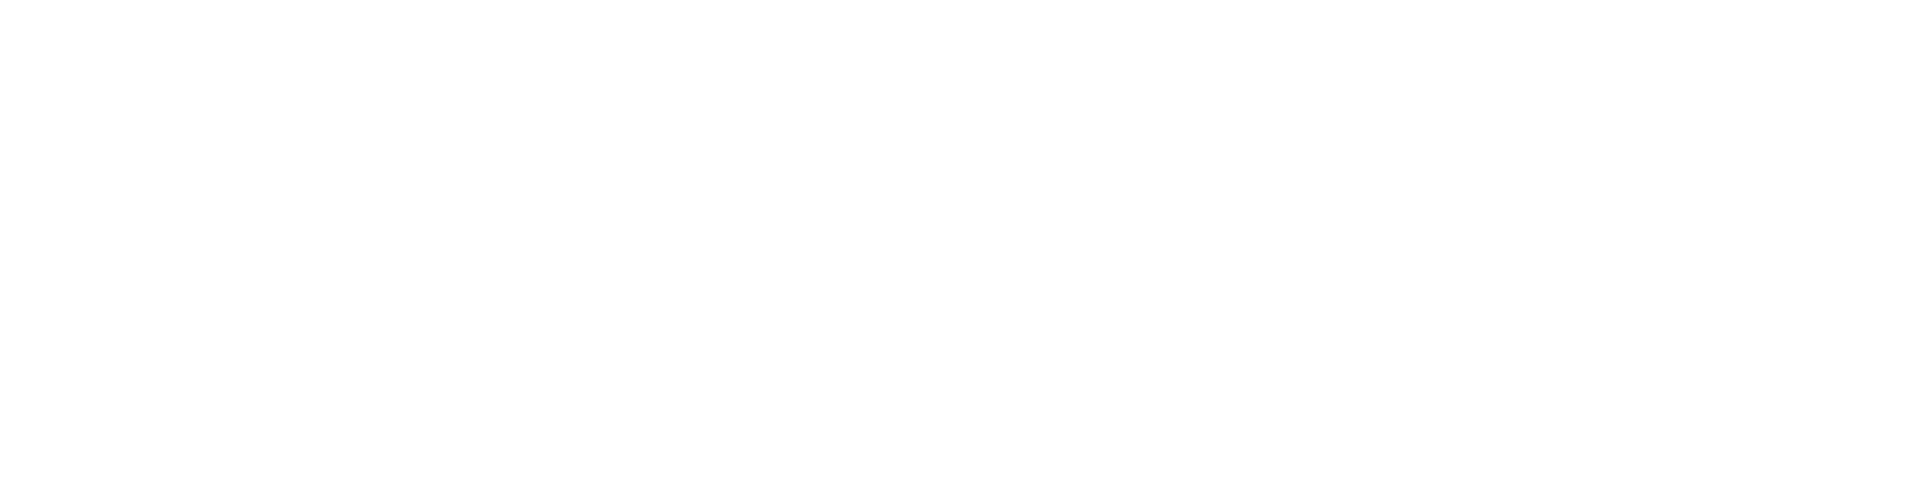 Leesspa - Home Page